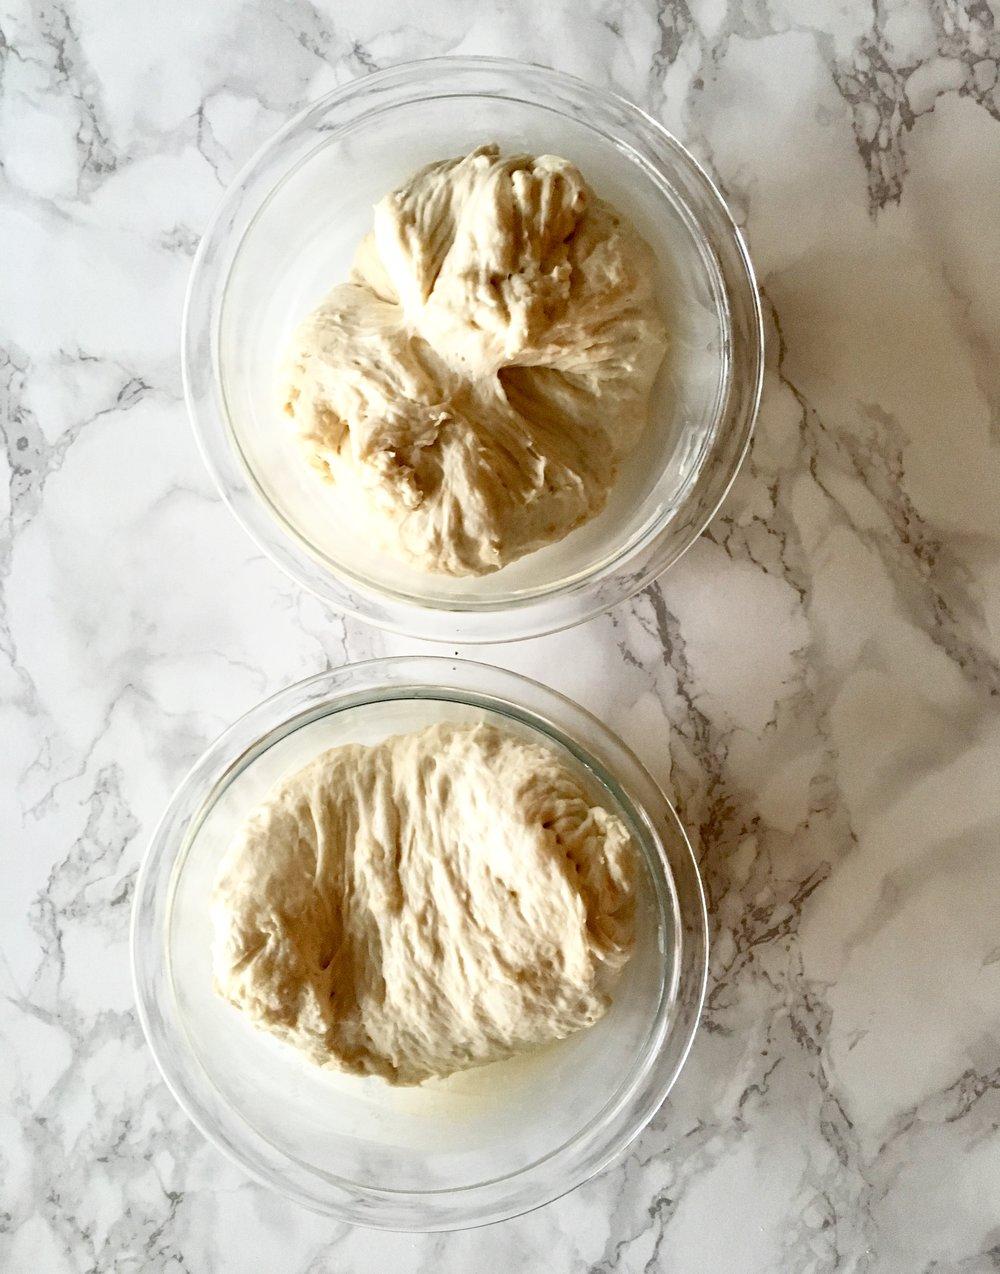 Pop each dough in it's own little bowl home